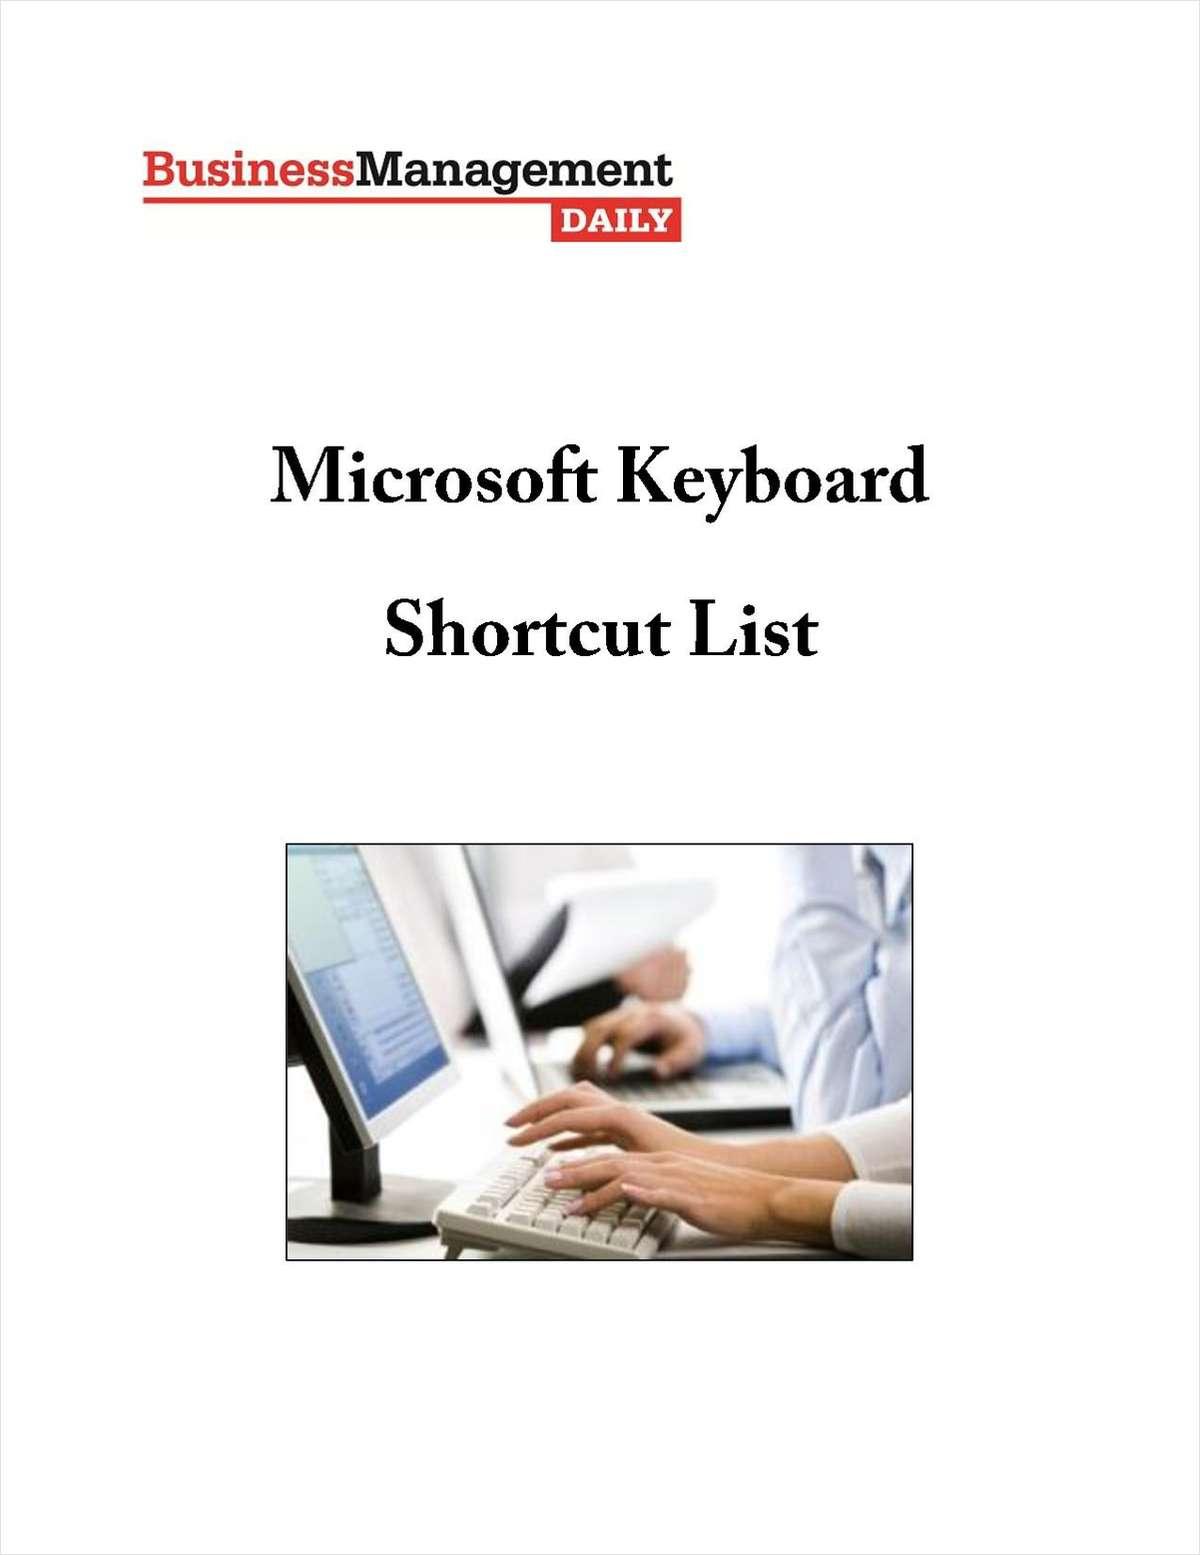 Microsoft Keyboard Shortcut List